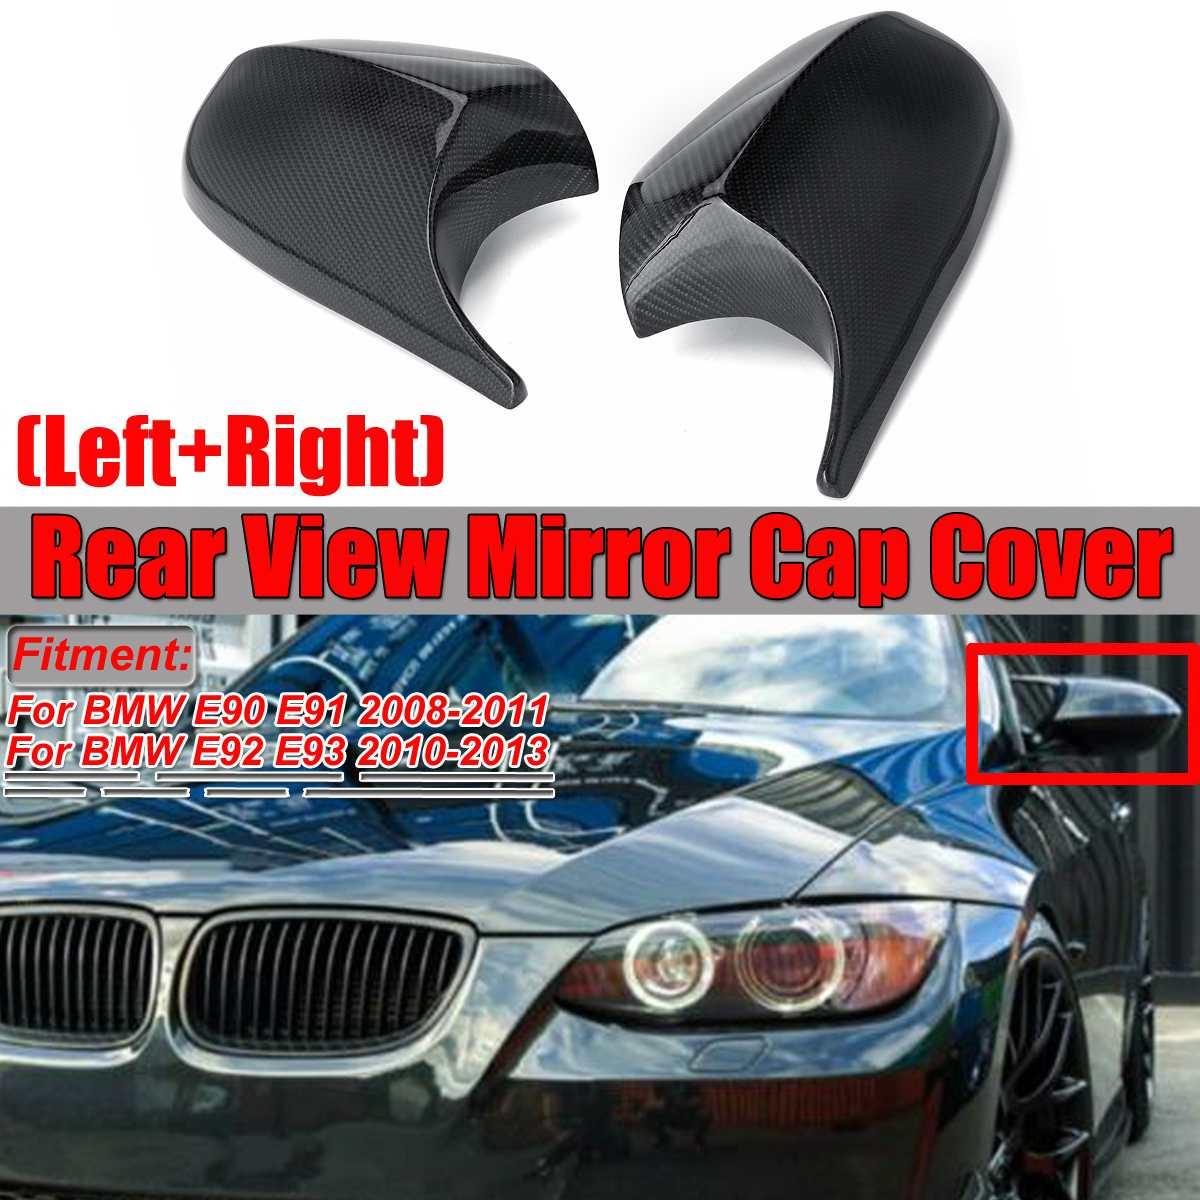 2 adet gerçek karbon Fiber/ABS ayna kapağı E90 araba dikiz aynası kapatma başlığı doğrudan yerine BMW E90 E91 08 -11 E92 E93 10-13 LCI